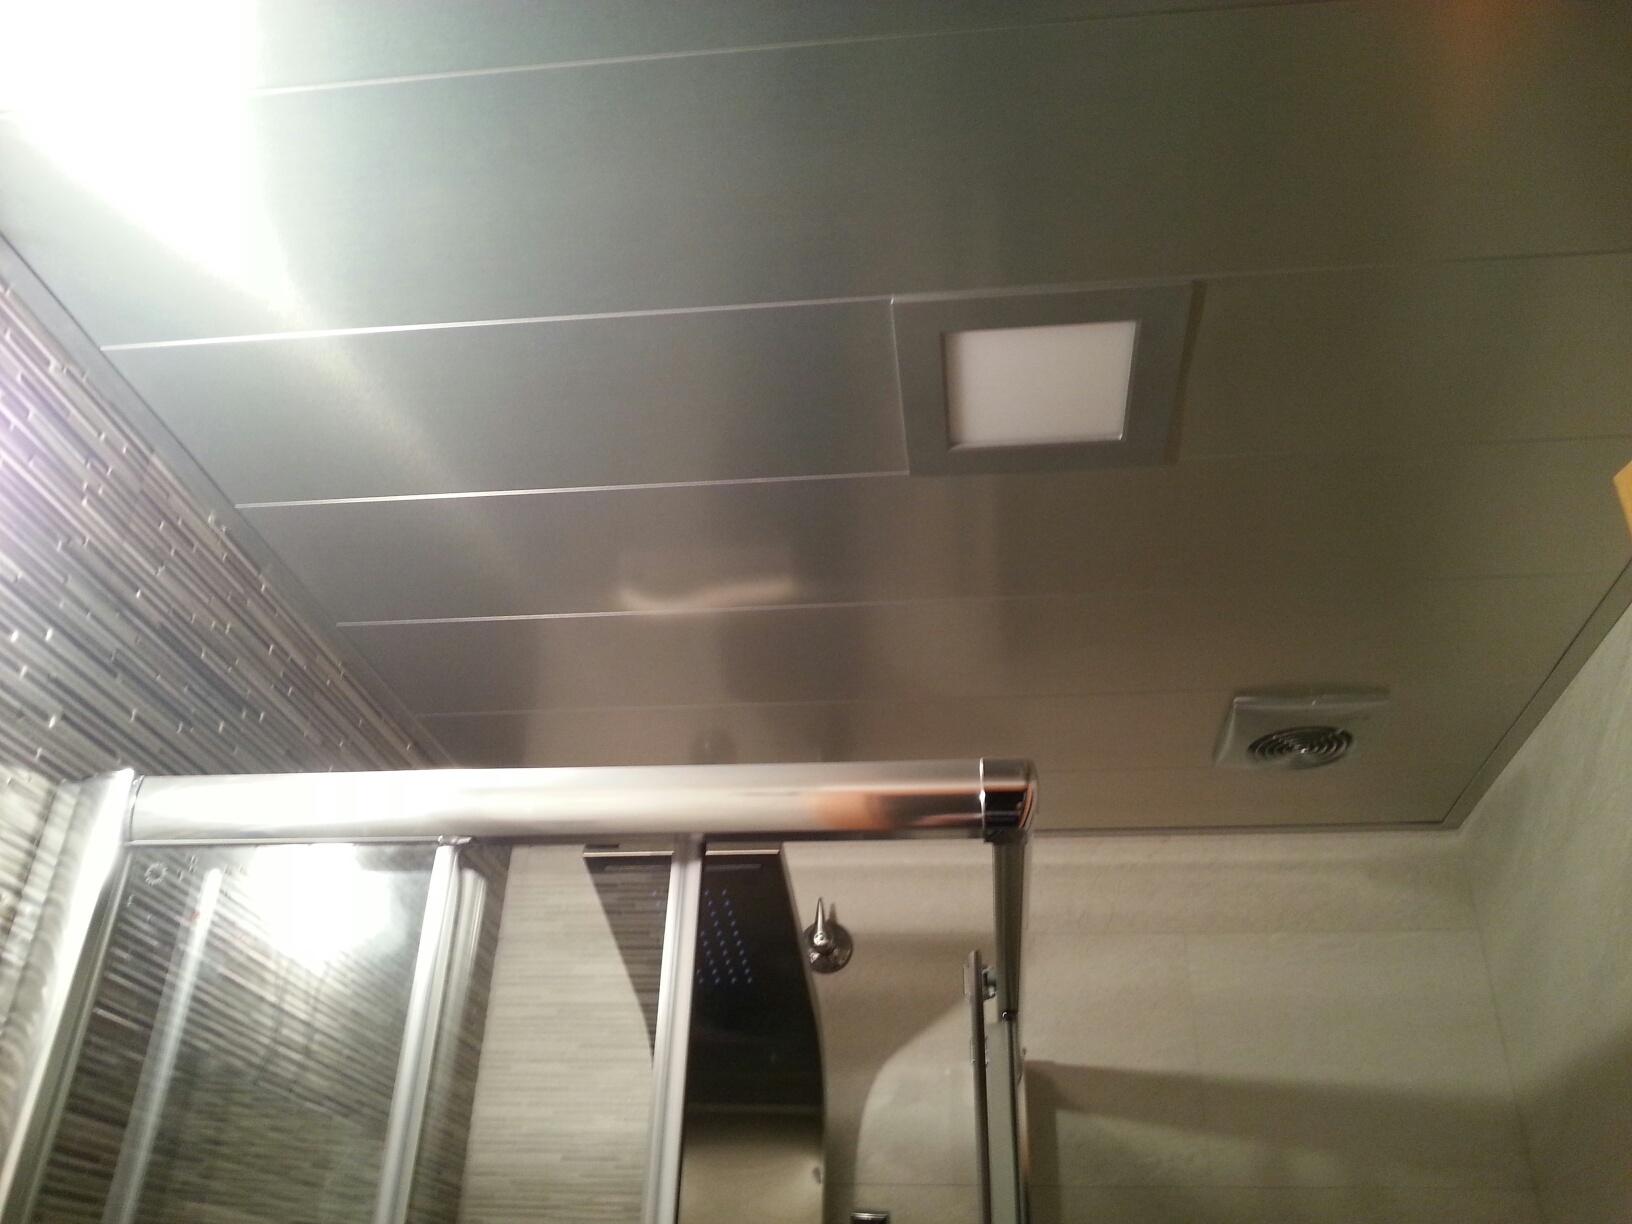 Fabricaci n venta e instalaci n de techos de aluminio en - Falso techo aluminio ...